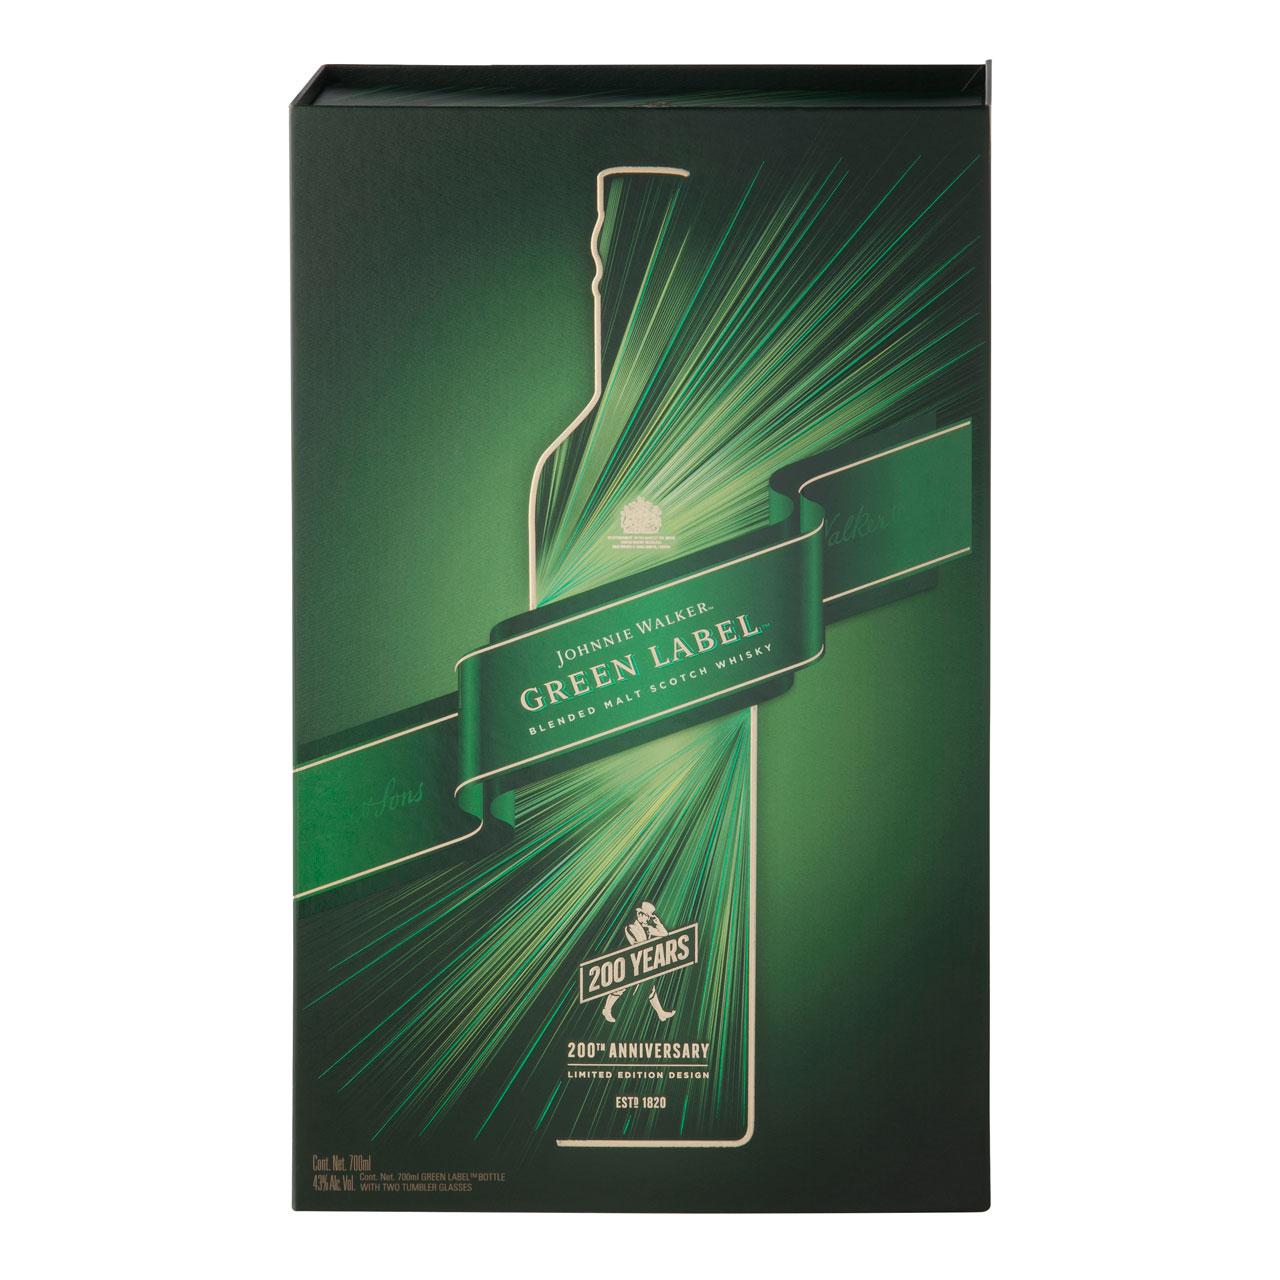 Johnnie Walker Green Label 15 años 200th